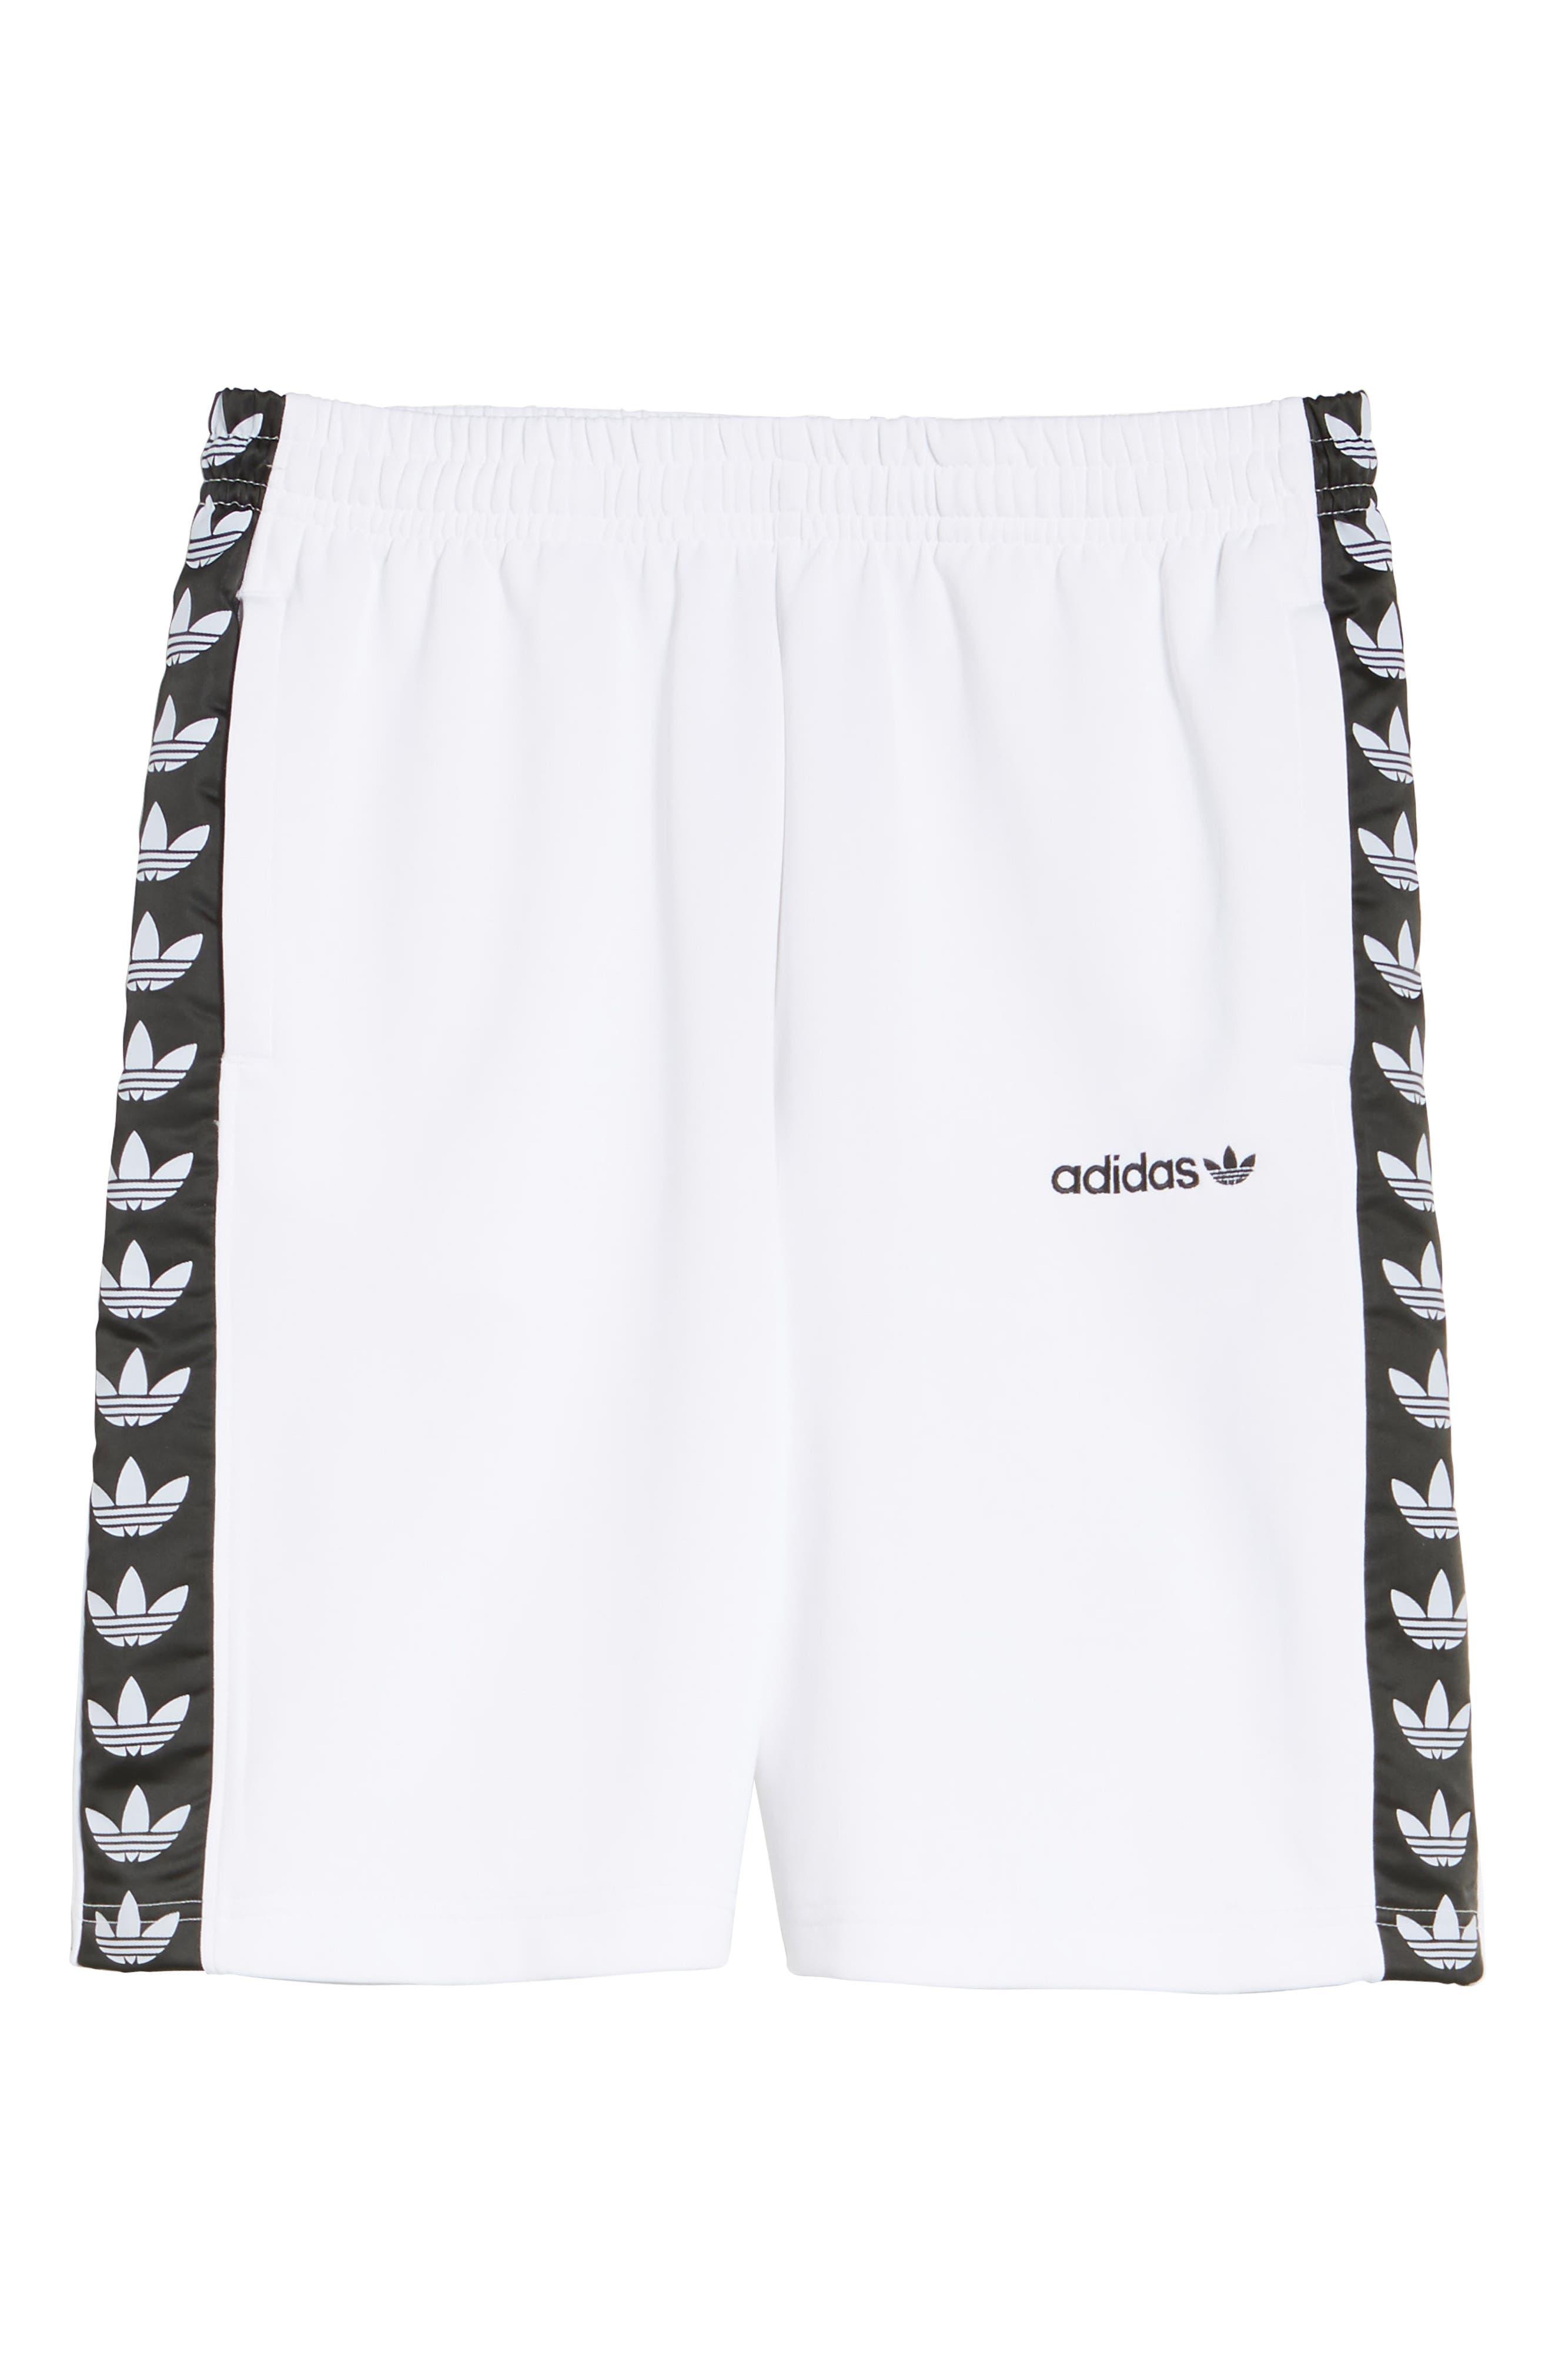 Originals TNT Shorts,                             Alternate thumbnail 6, color,                             White